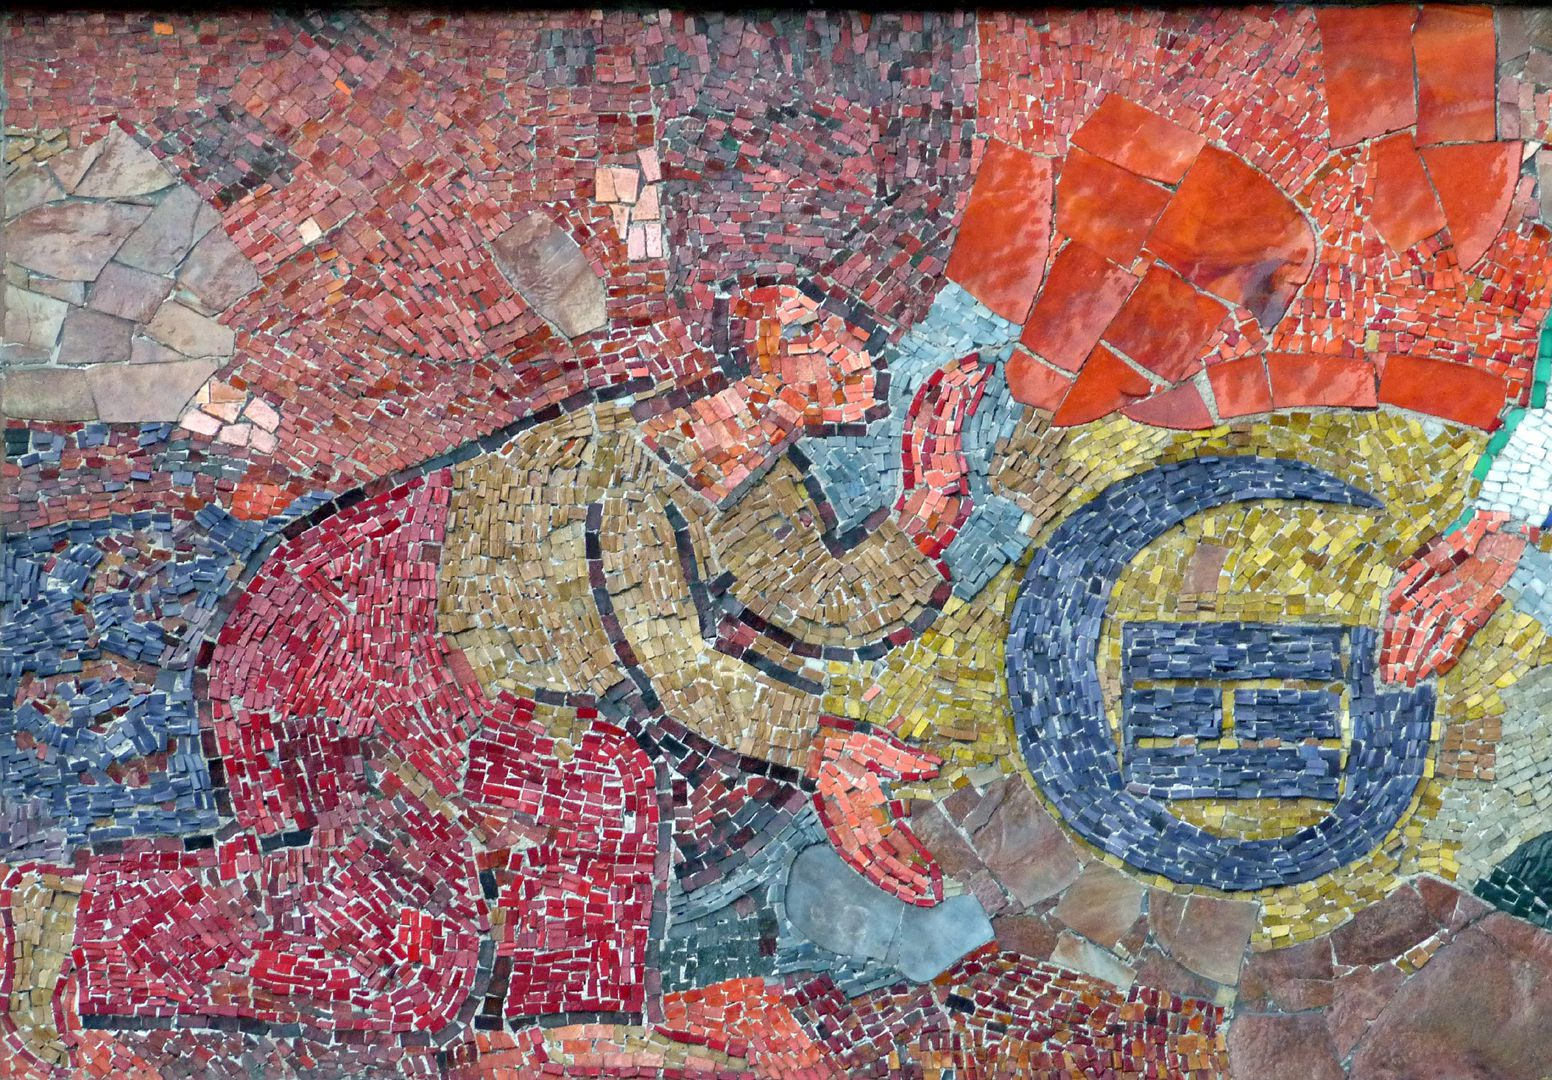 Mosaic on the Main Market (Hauptmarkt) in Nuremberg